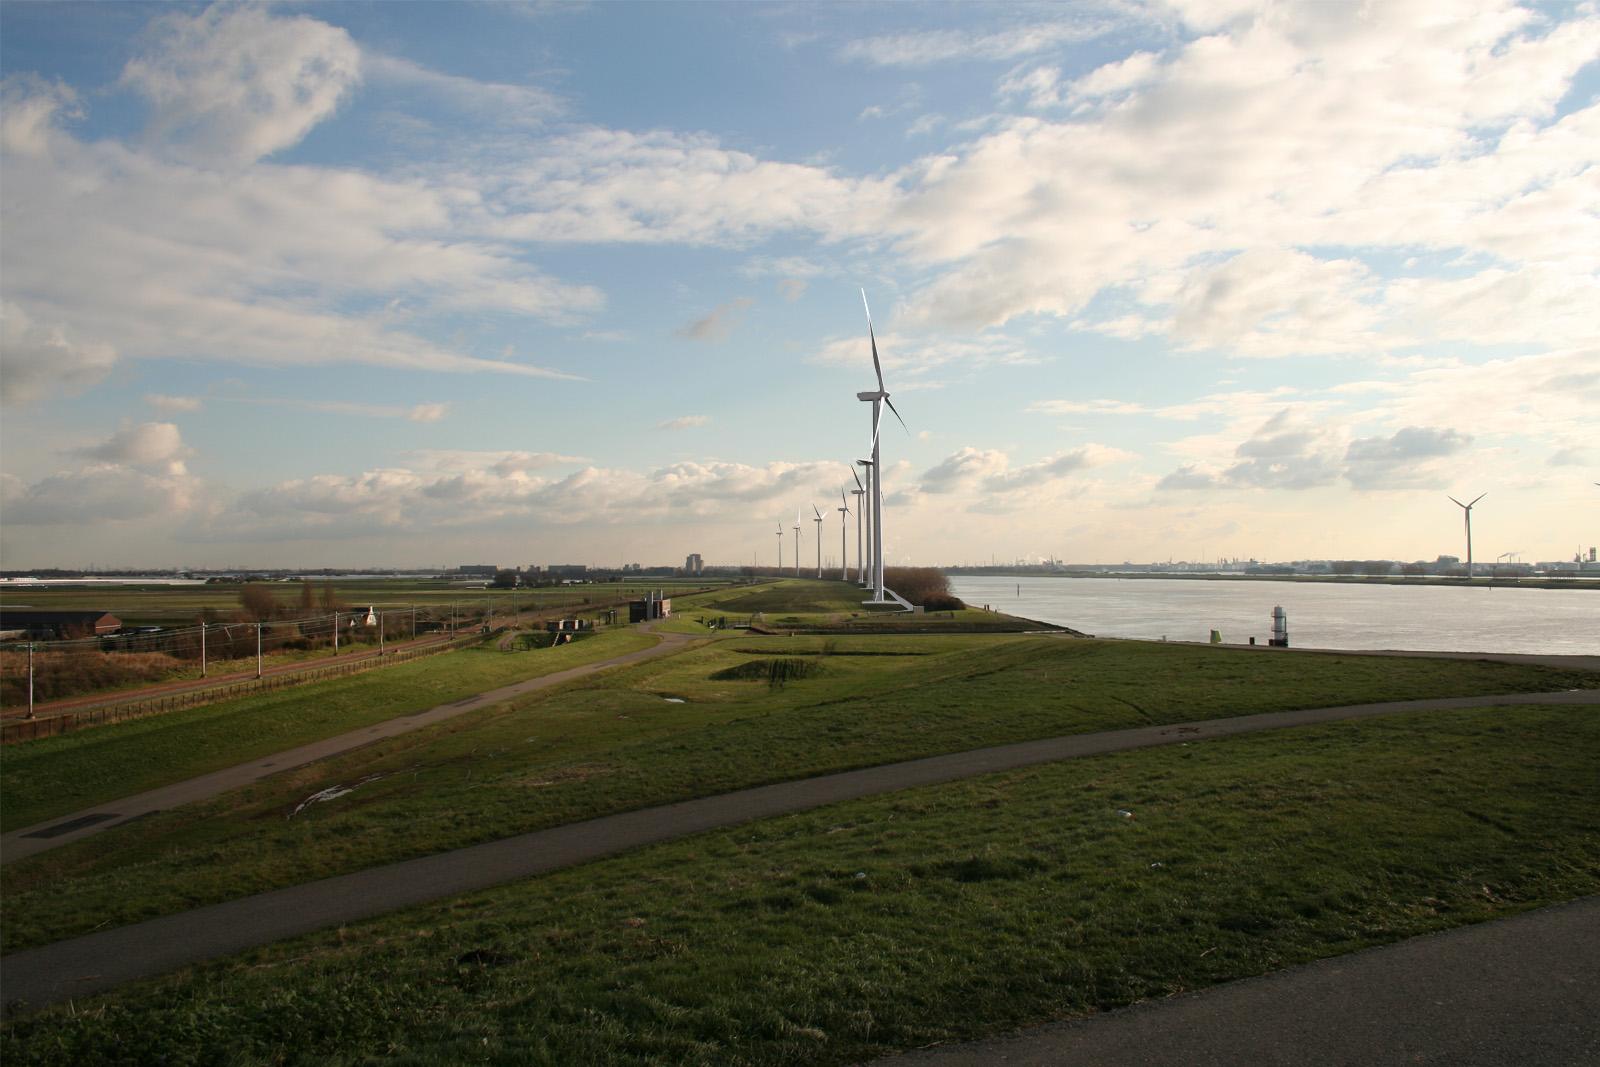 Vergunning Windpark Nieuwe Waterweg definitief verleend